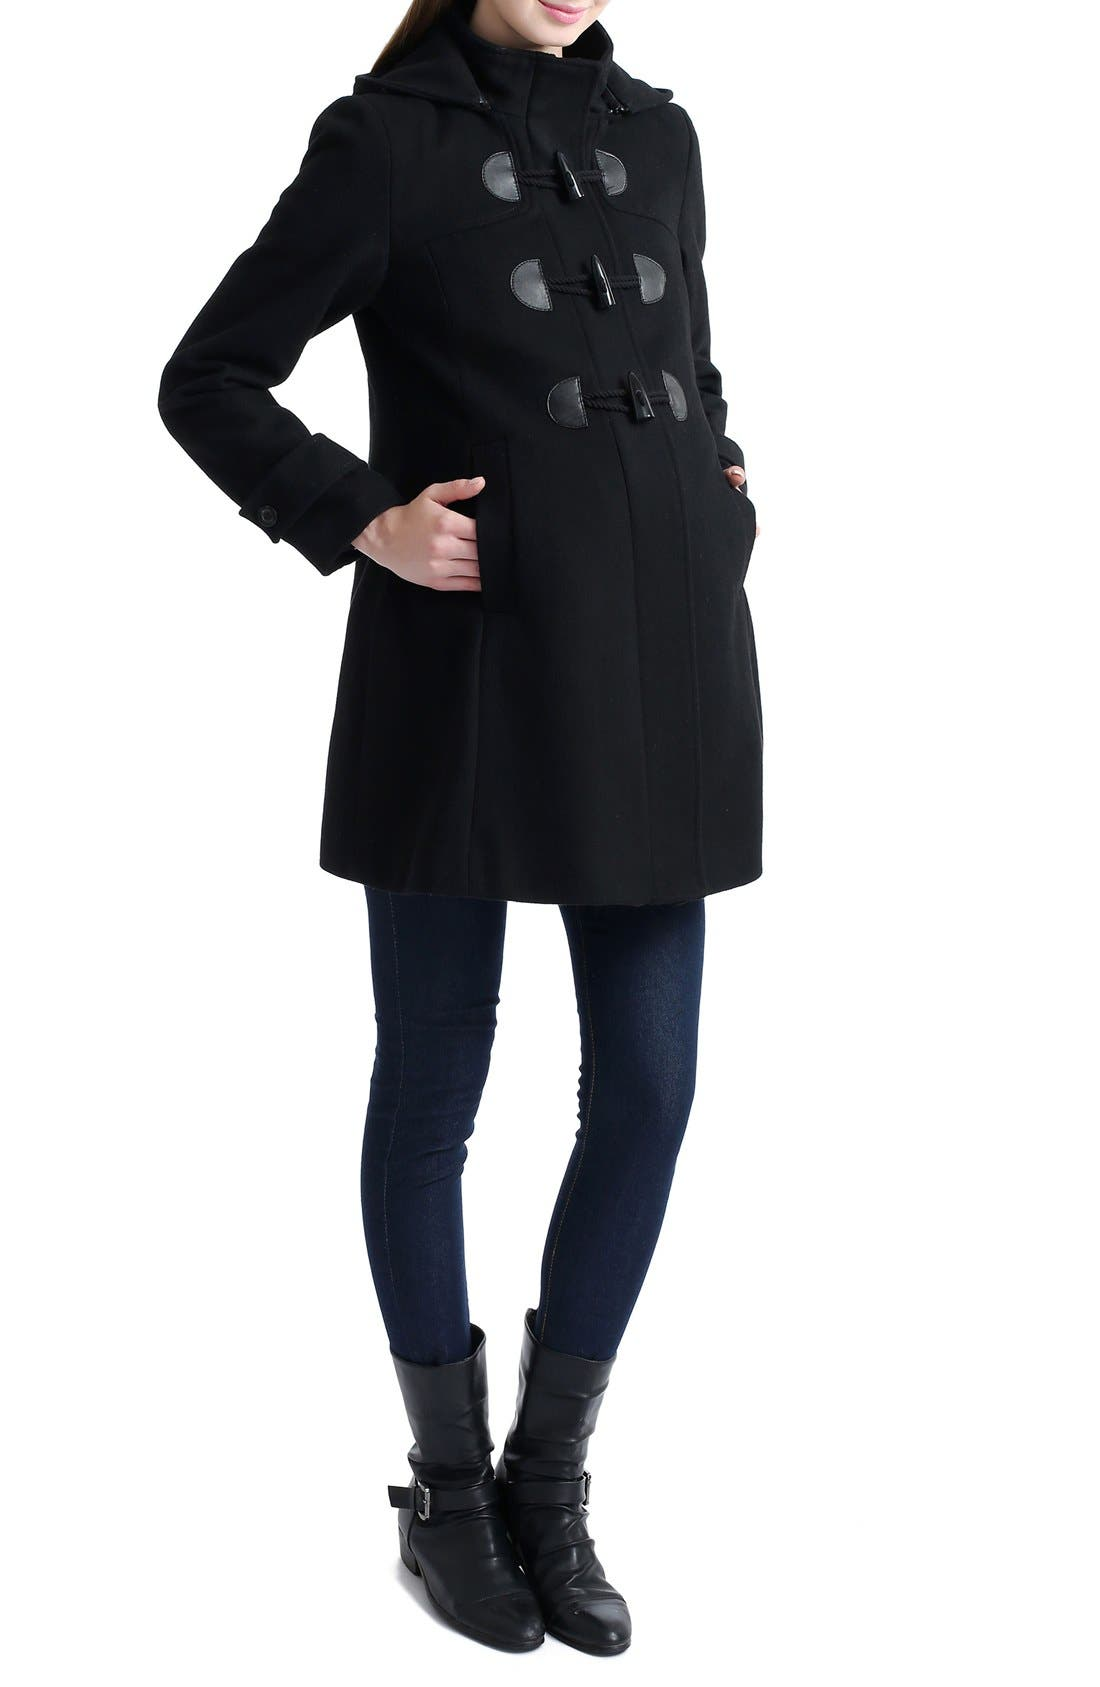 KIMI AND KAI 'Paisley' Maternity Duffle Coat, Main, color, BLACK